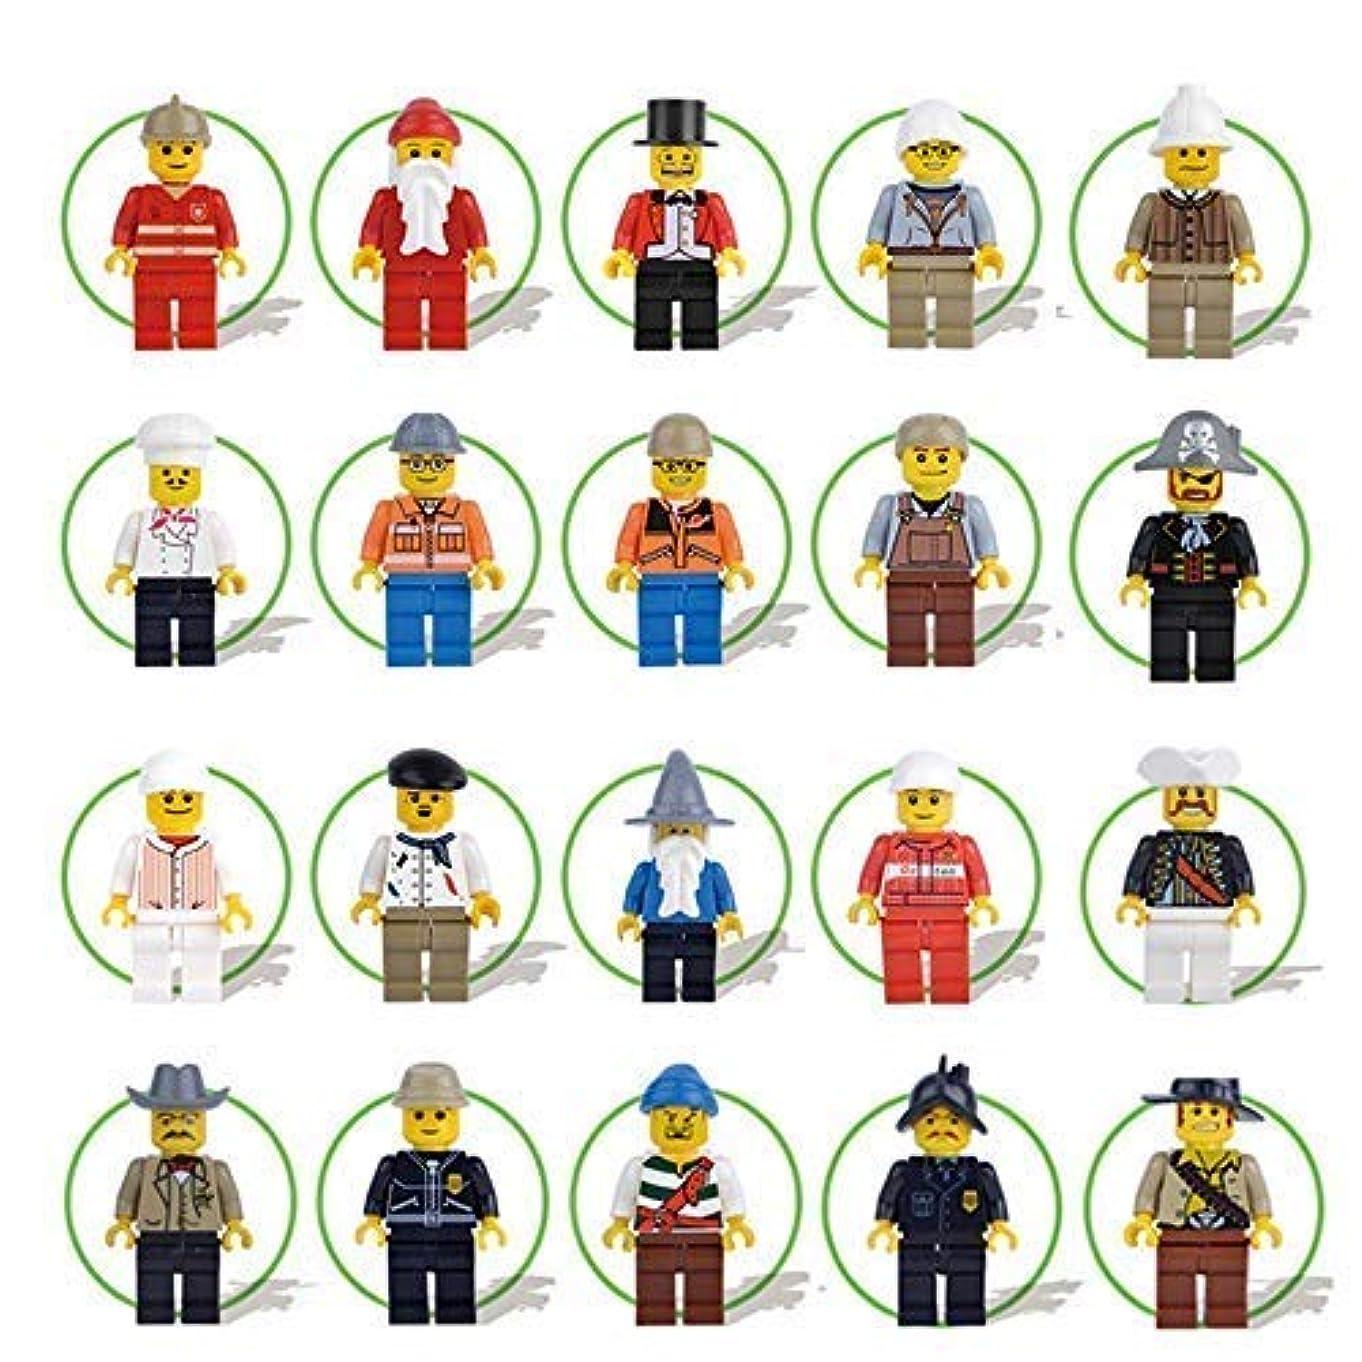 20pcs Different Figures Occupations Building Blocks Brick DIY Toys Children Gift